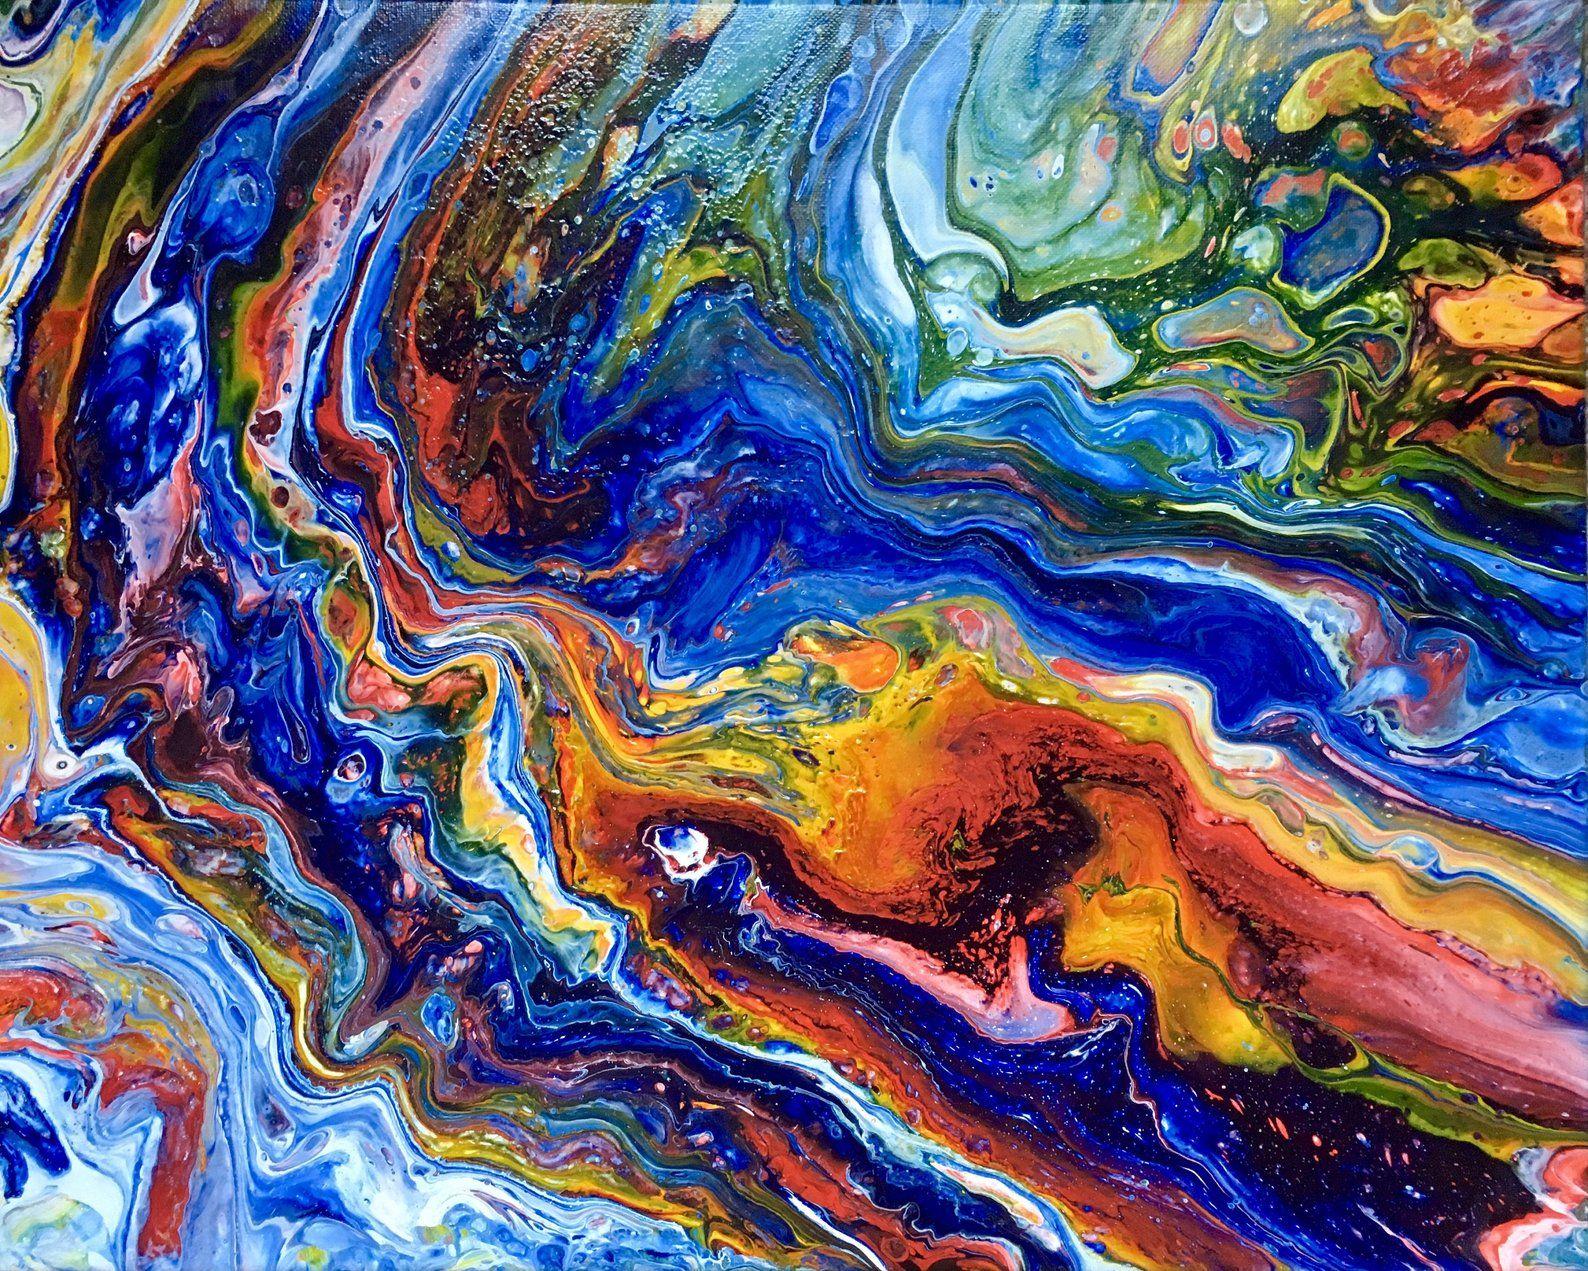 Abstract fluid art painting 16x20 wall art abstract art